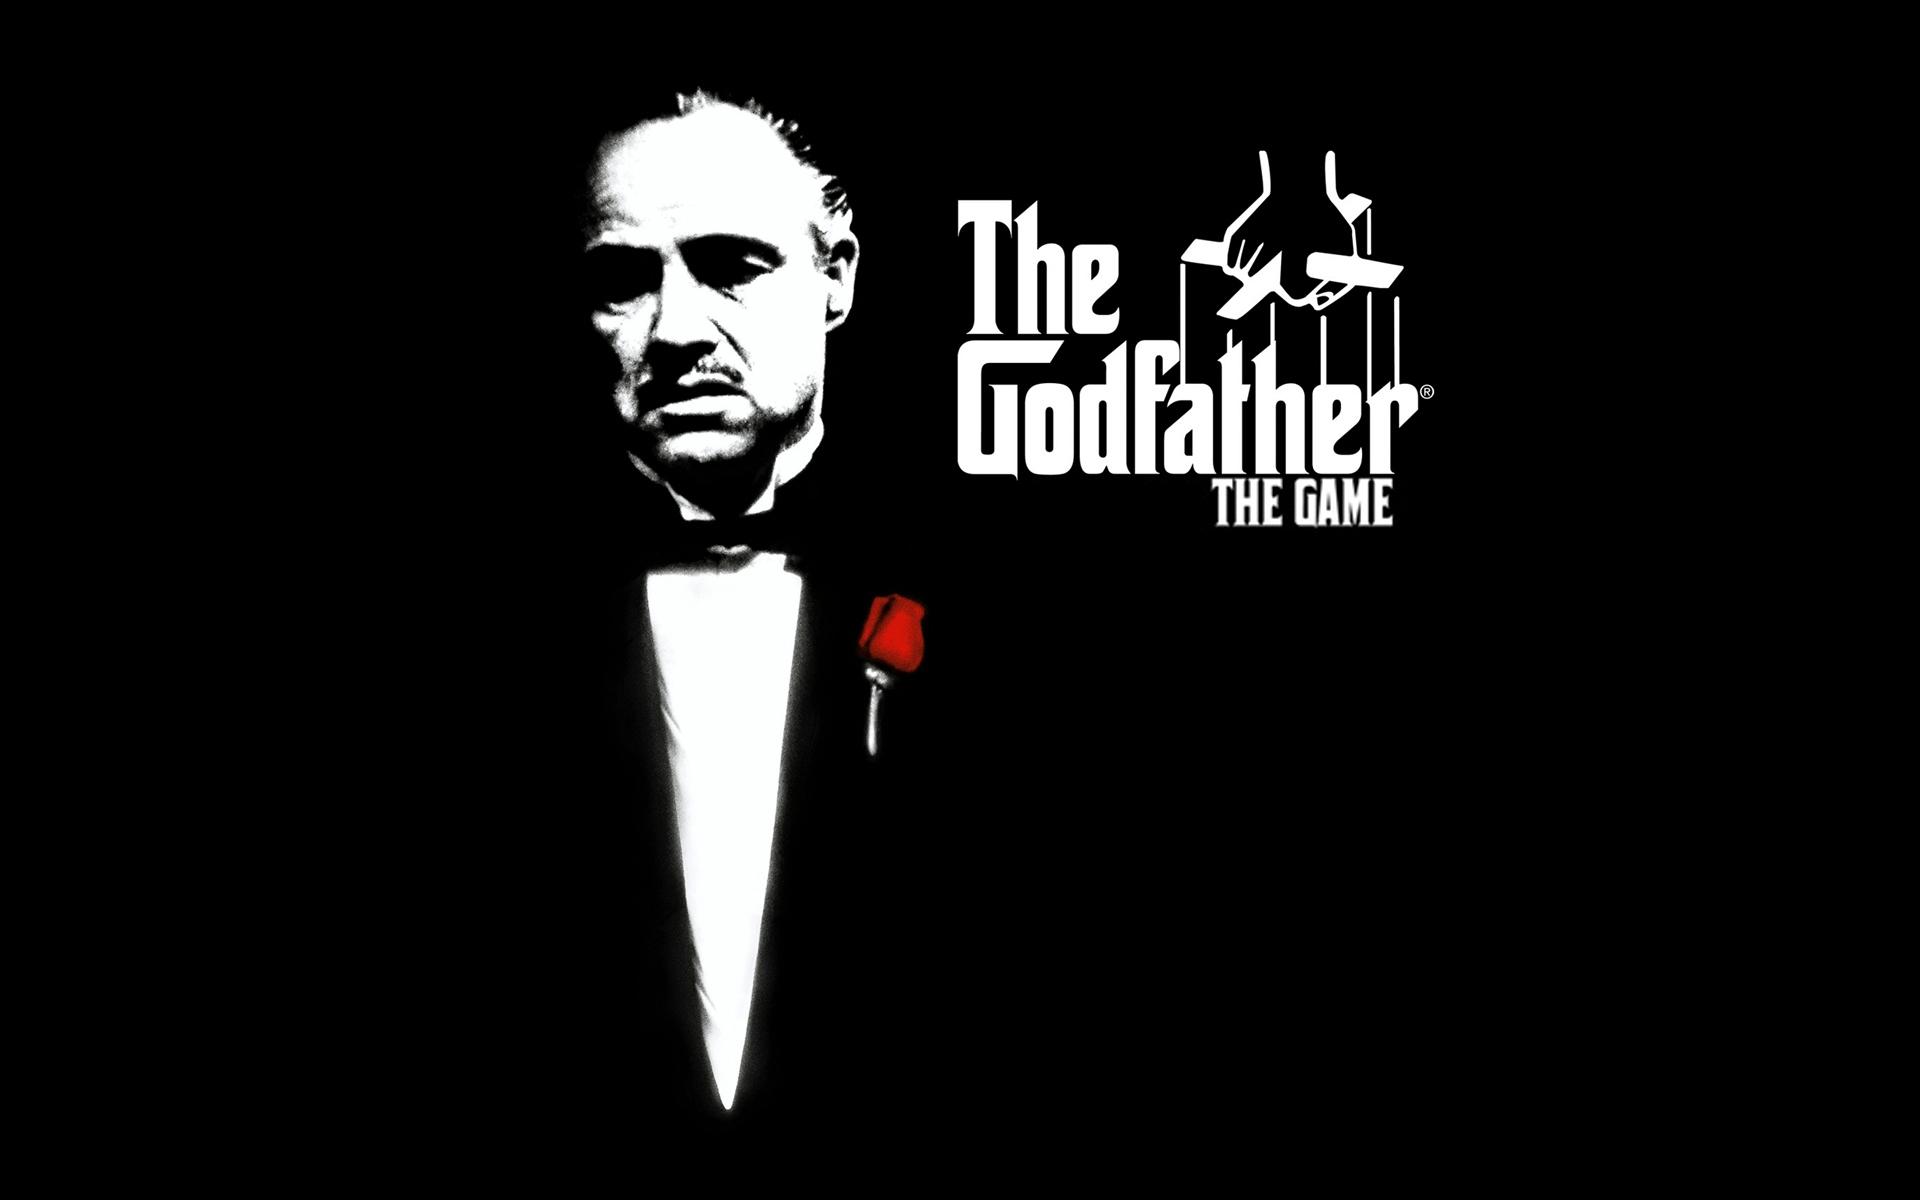 Download Wallpaper 1920x1200 Godfather Marlon brando Don 1920x1200